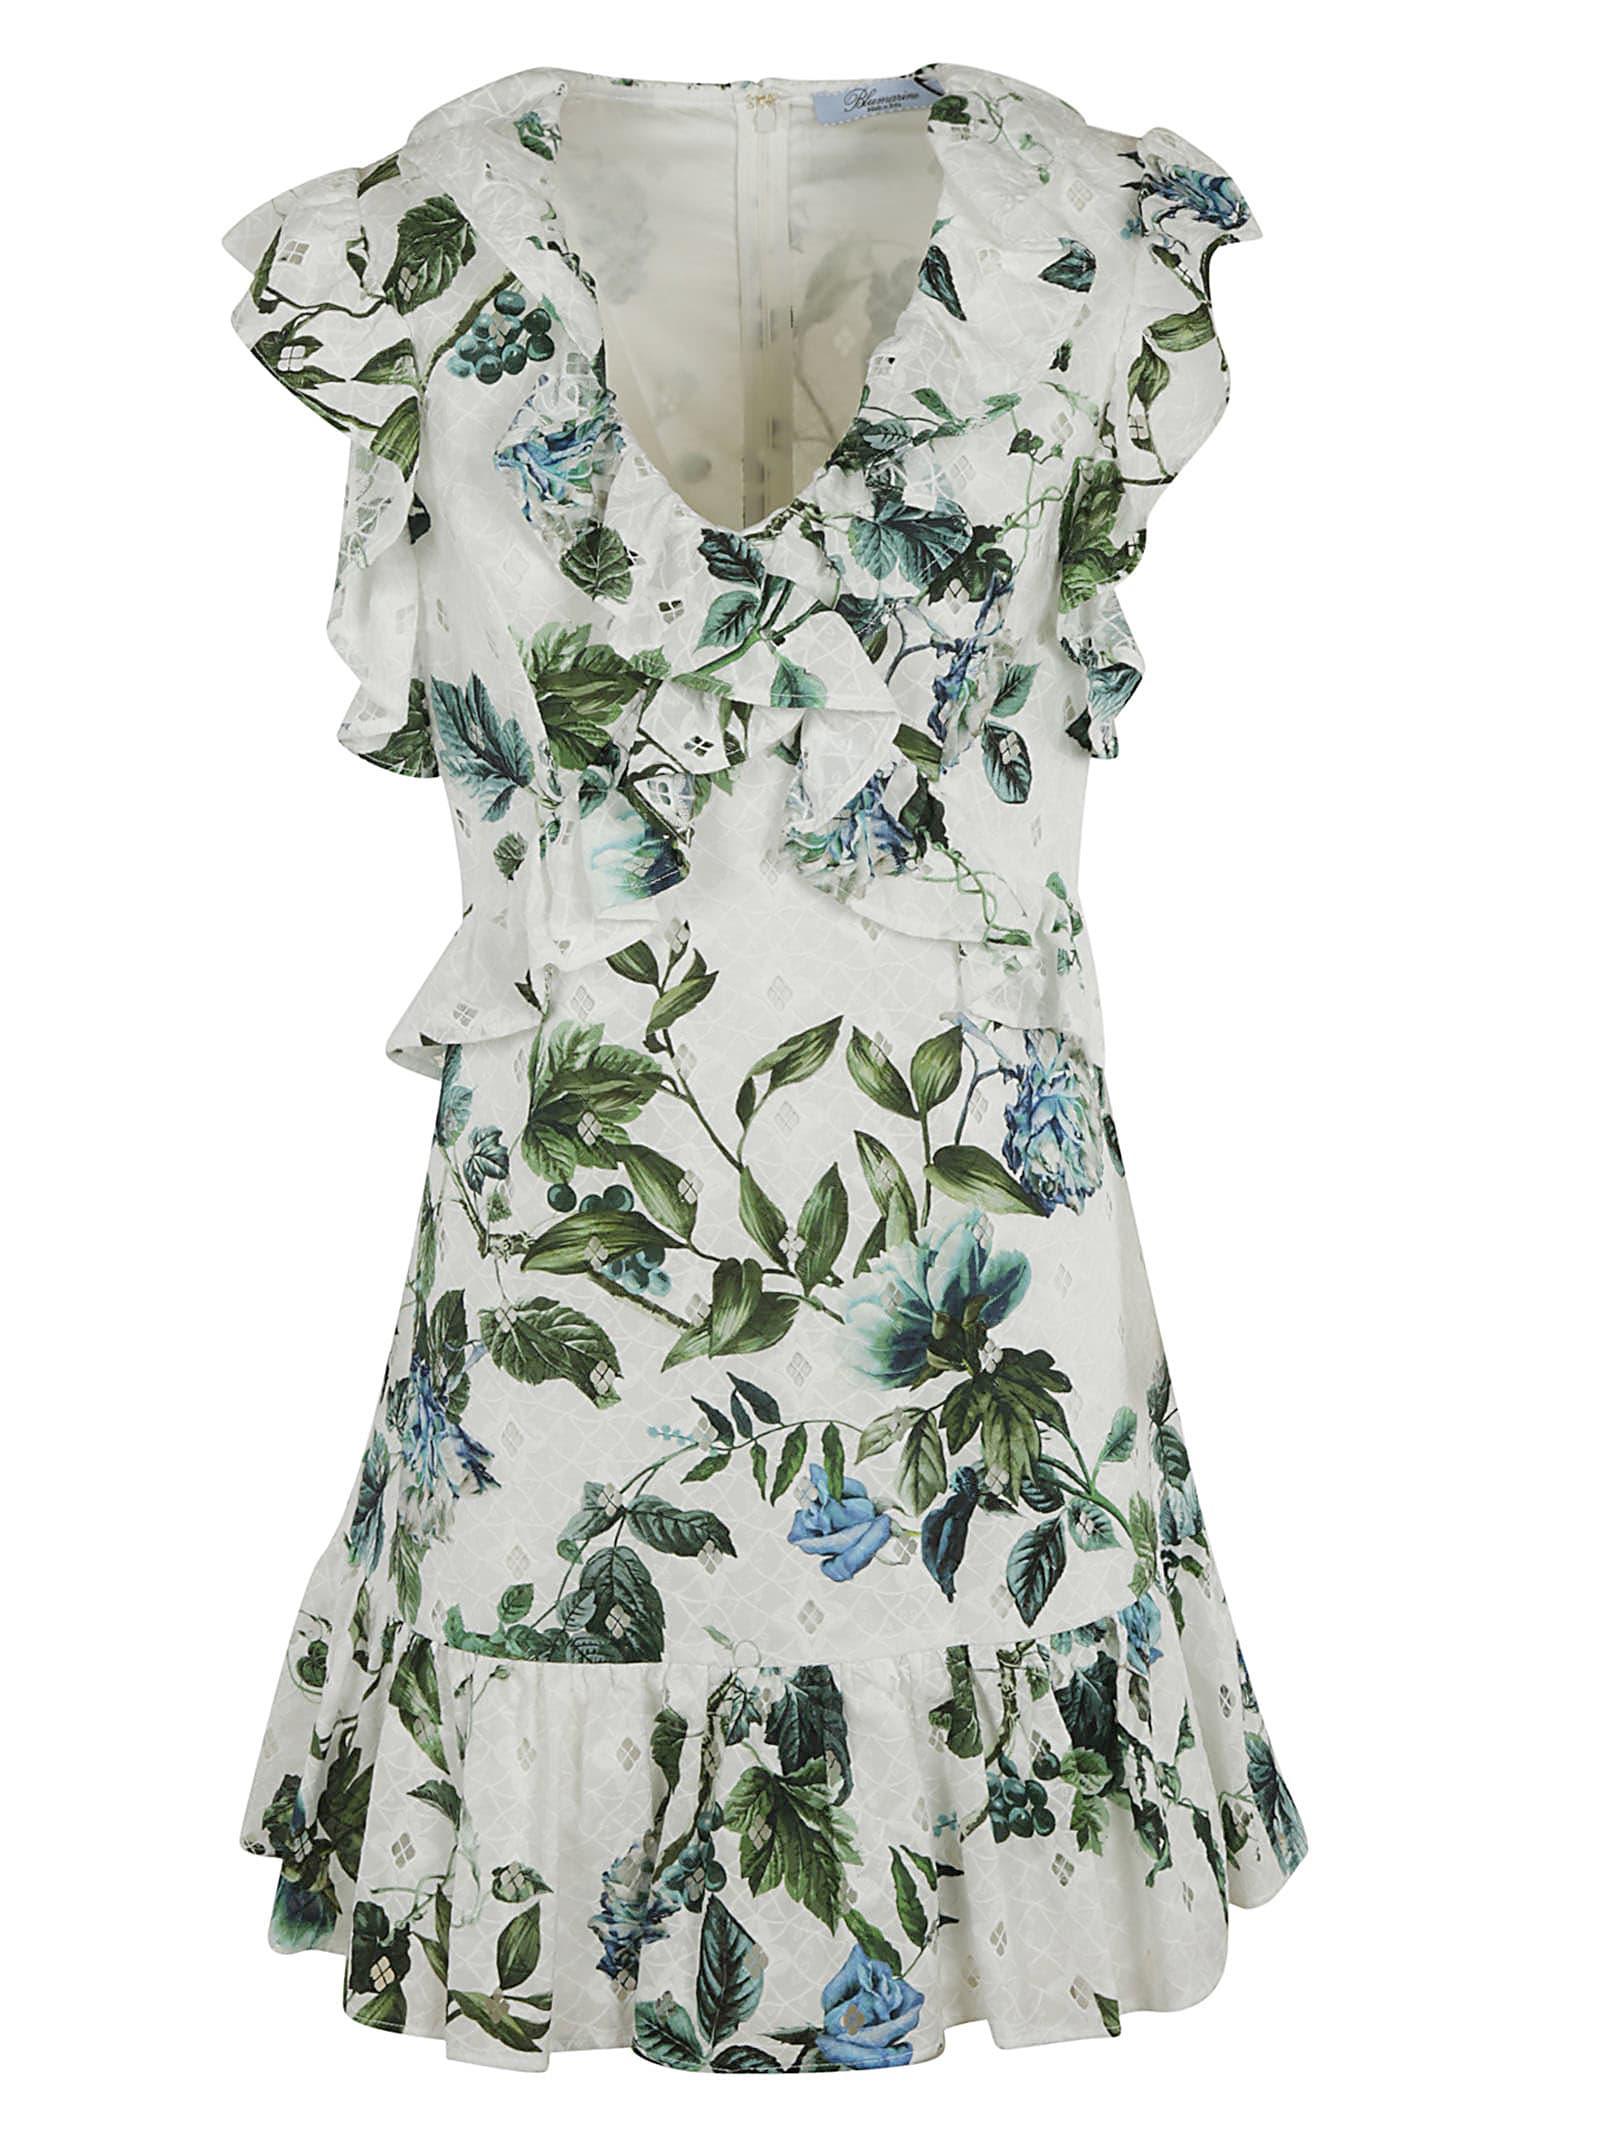 Buy Blumarine Floral Print Ruffled Dress online, shop Blumarine with free shipping